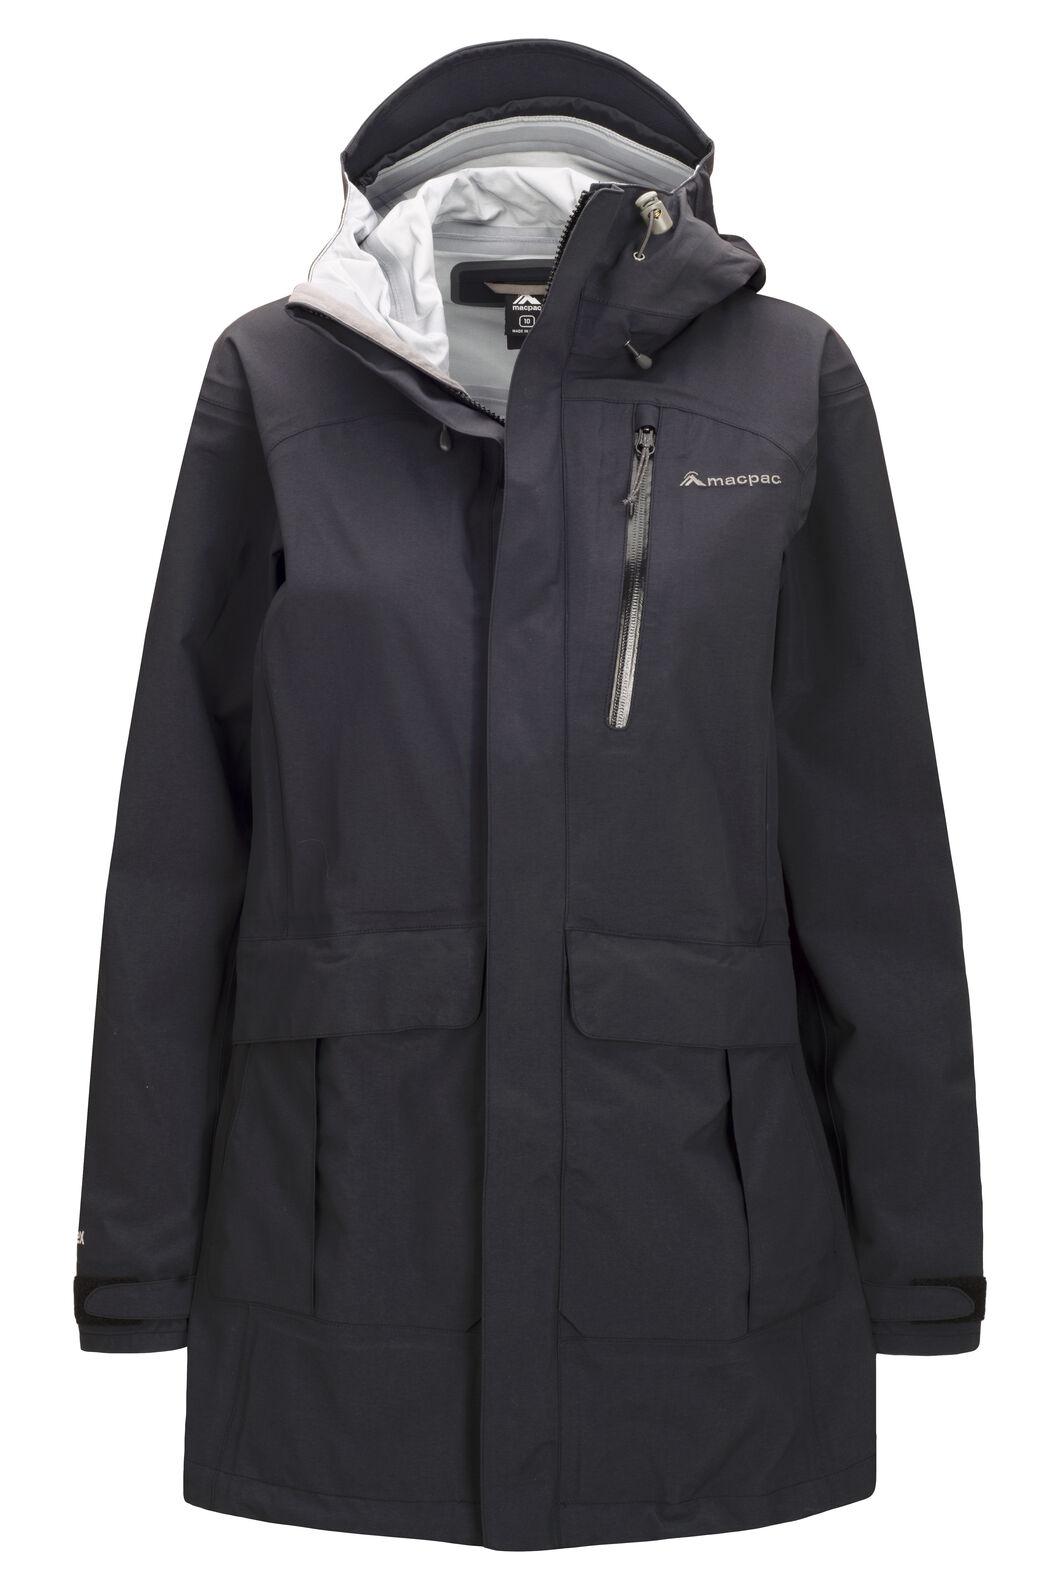 Macpac Women's Copland Long Rain Jacket, Black, hi-res